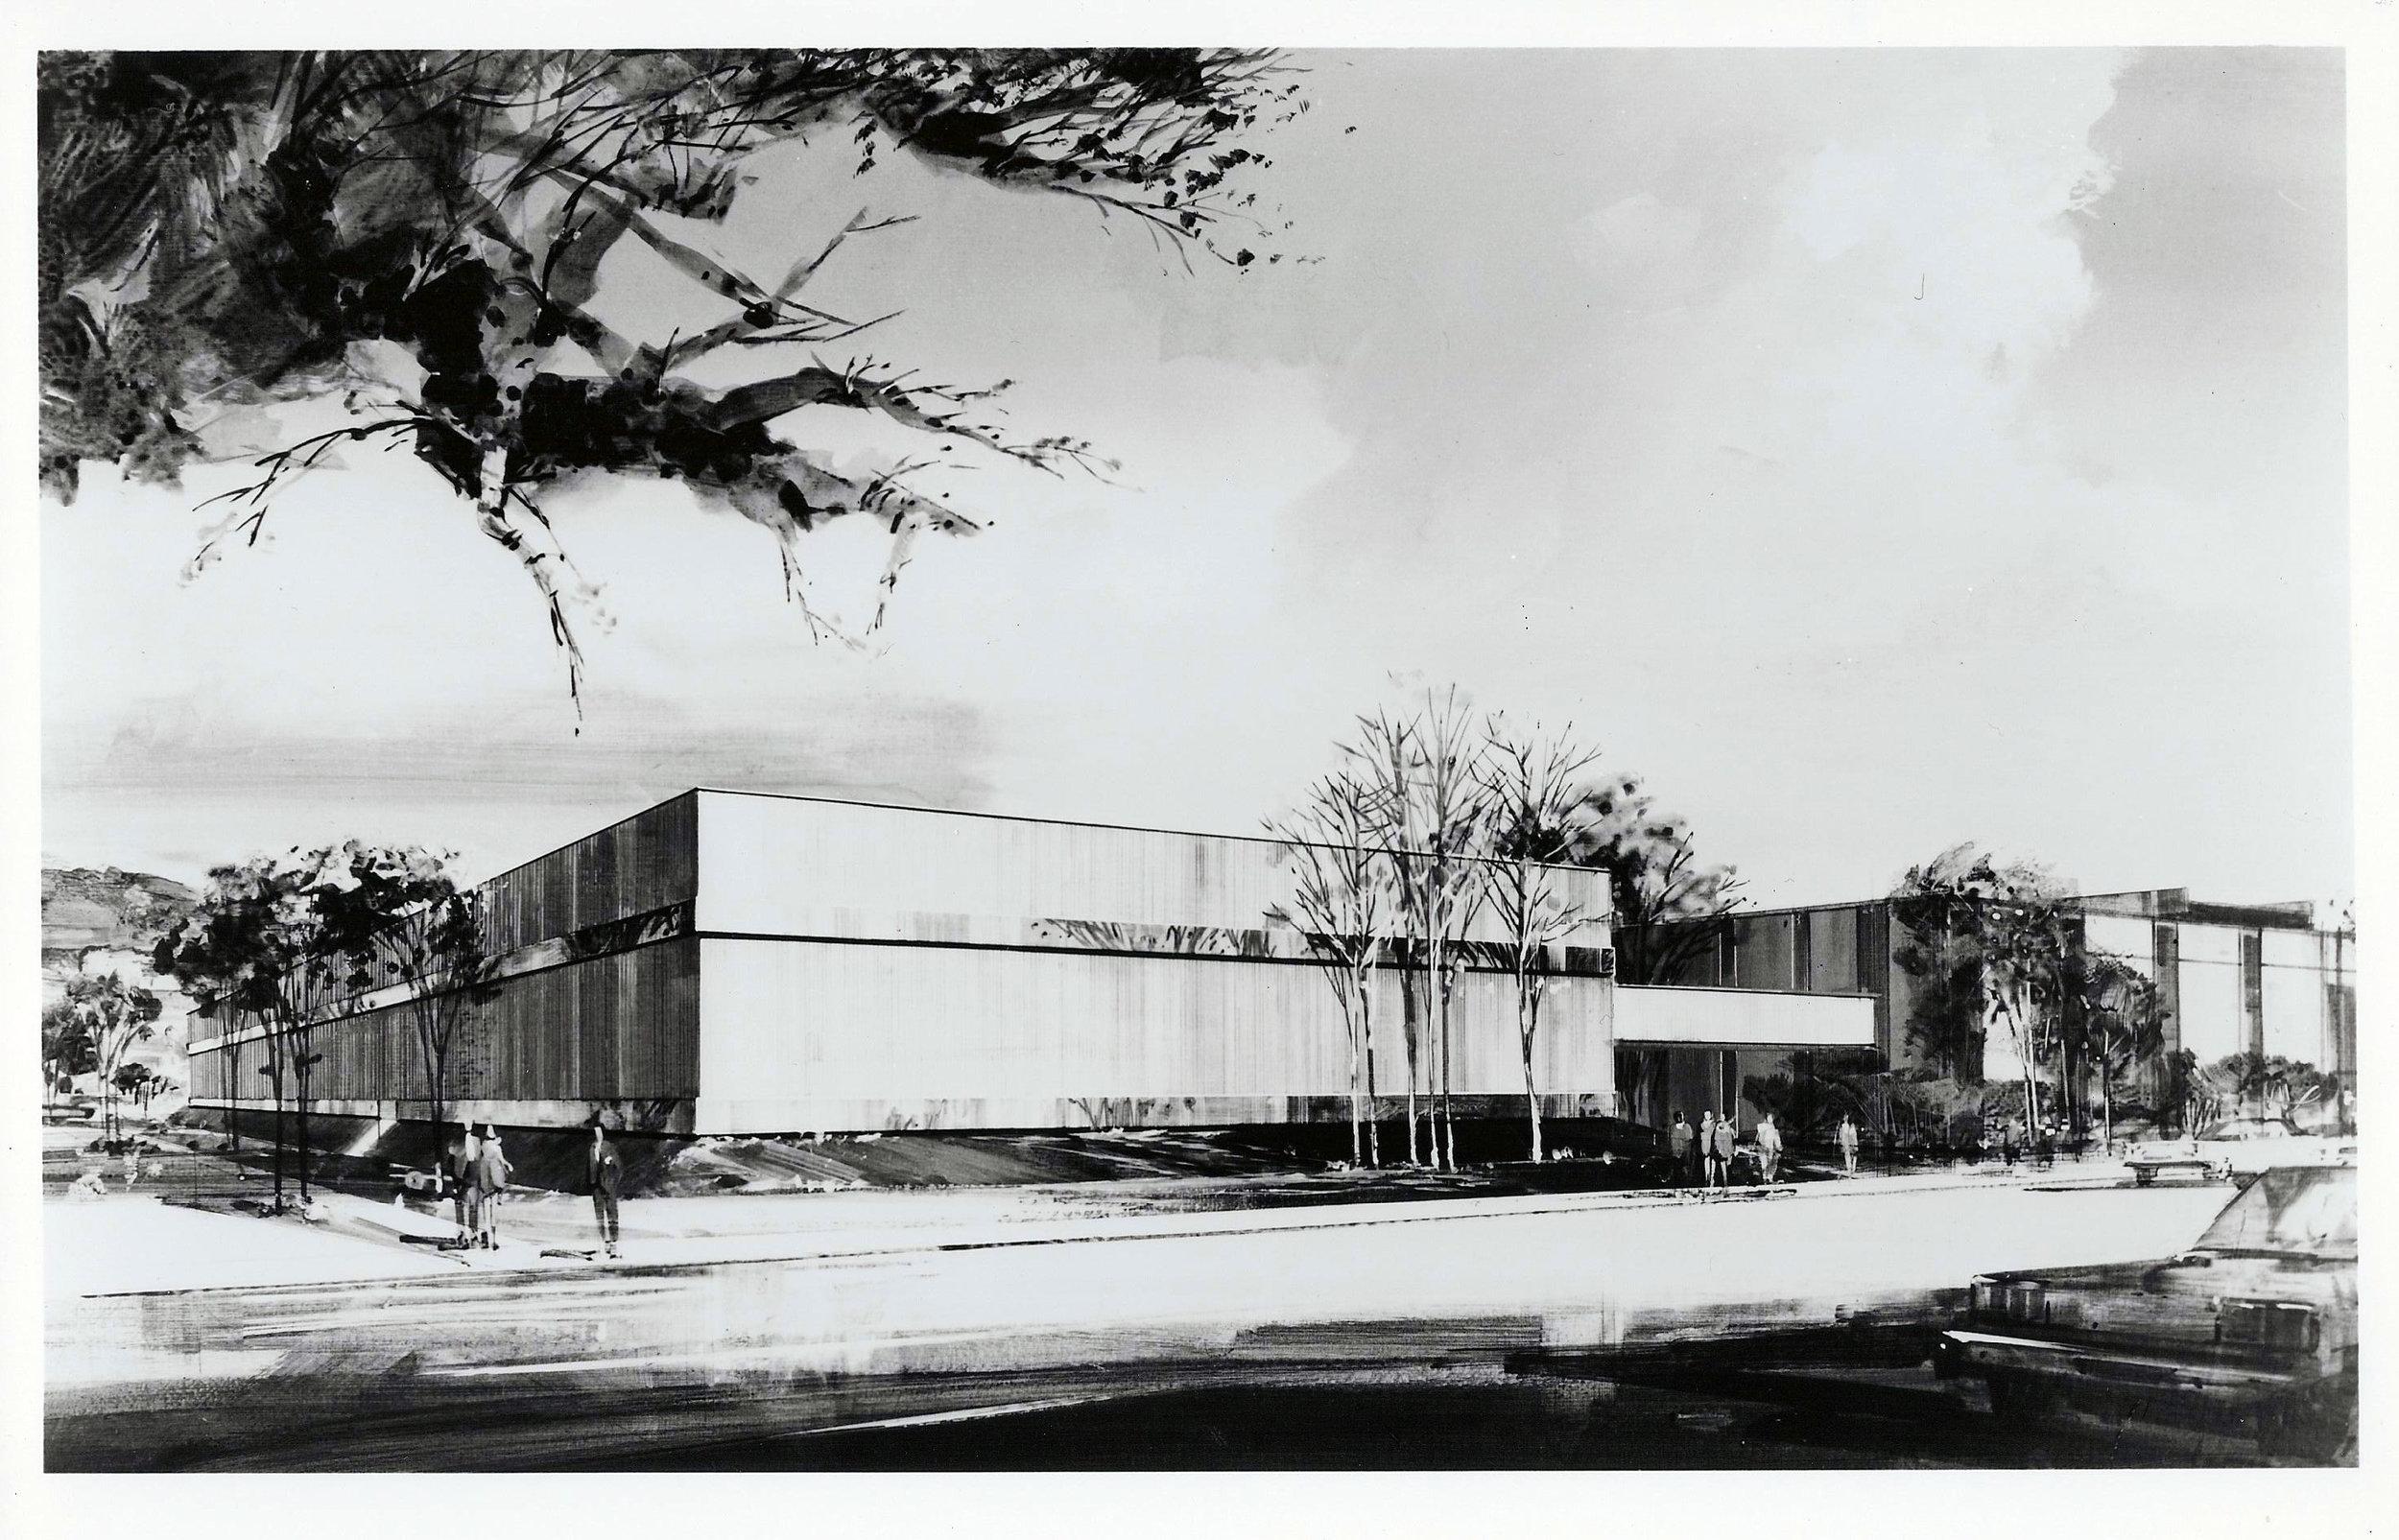 HANNA BARBERA ANNEX BUILDING